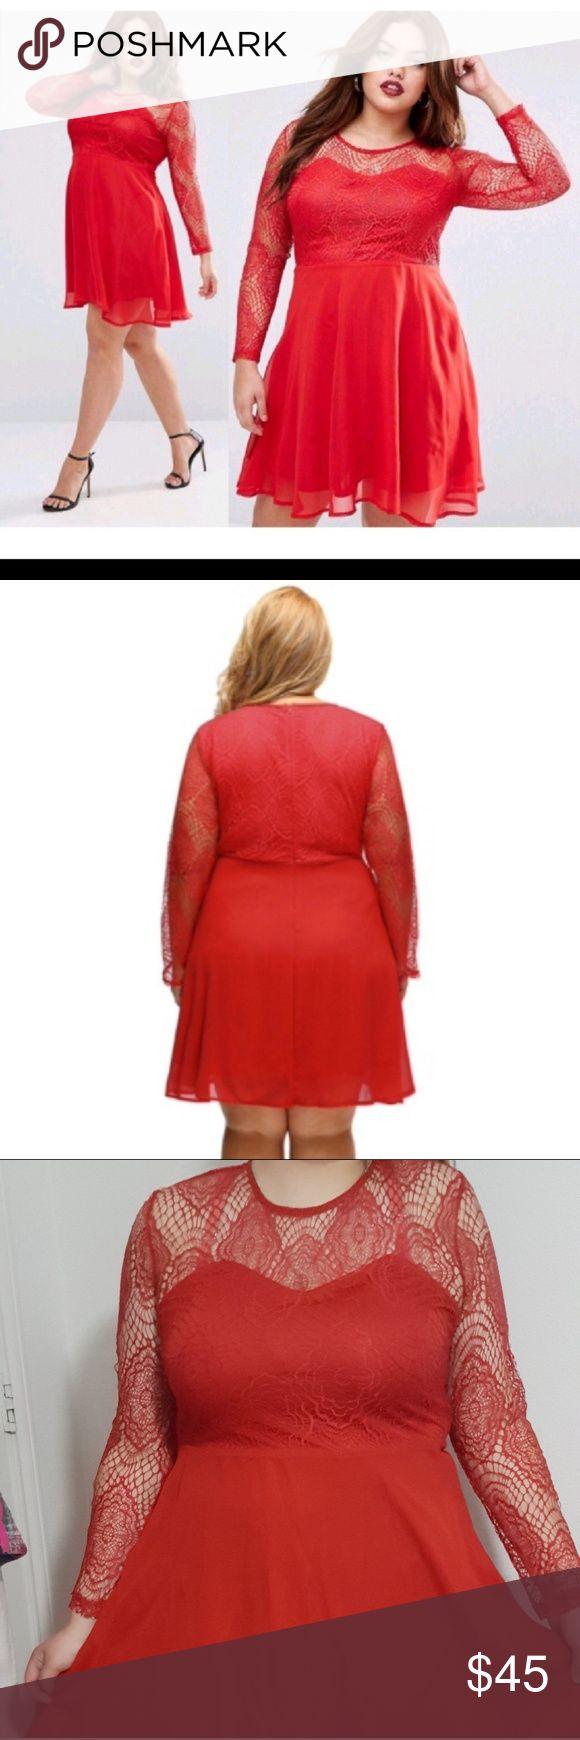 Boohoo Plus Size Lace Skater Dress Boohoo Plus Size Lace Skater Dress Size 16 but fits more like a 14.  Red Slated Dress with a flare at the bottom Boohoo Plus Dresses Mini